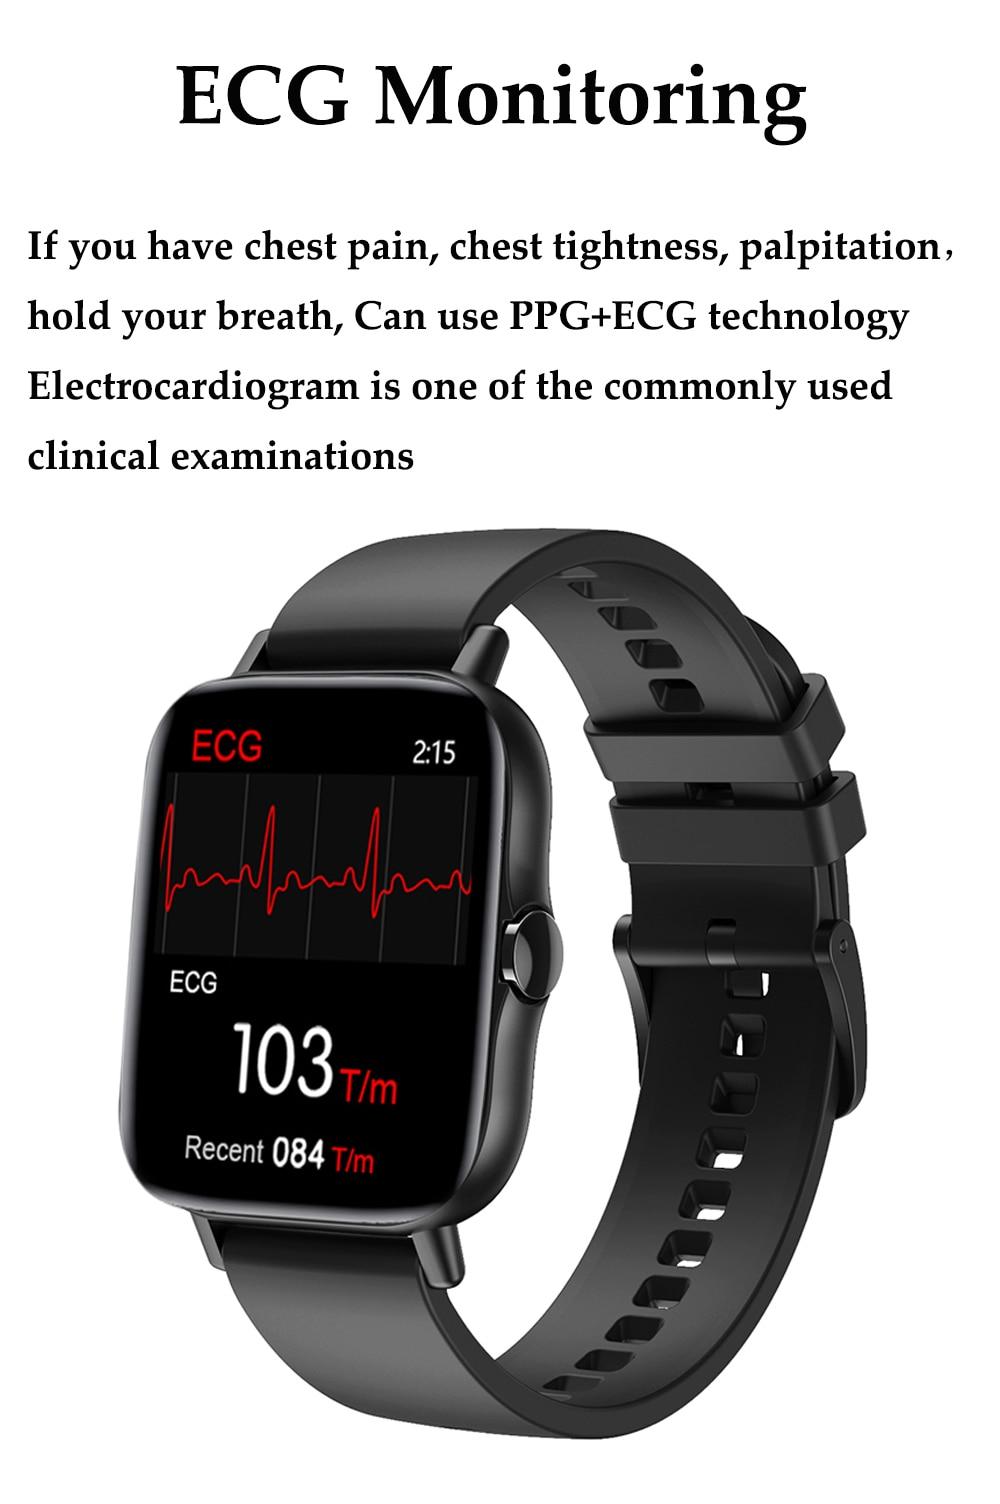 H76bee6e7529d4607be88a6c80eae7e939 For Xiaomi Apple Phone IOS Reloj Inteligente Hombre Smartwatch 2021 Men Bluetooth Call Smart Watch Man Woman Full Touch IP68